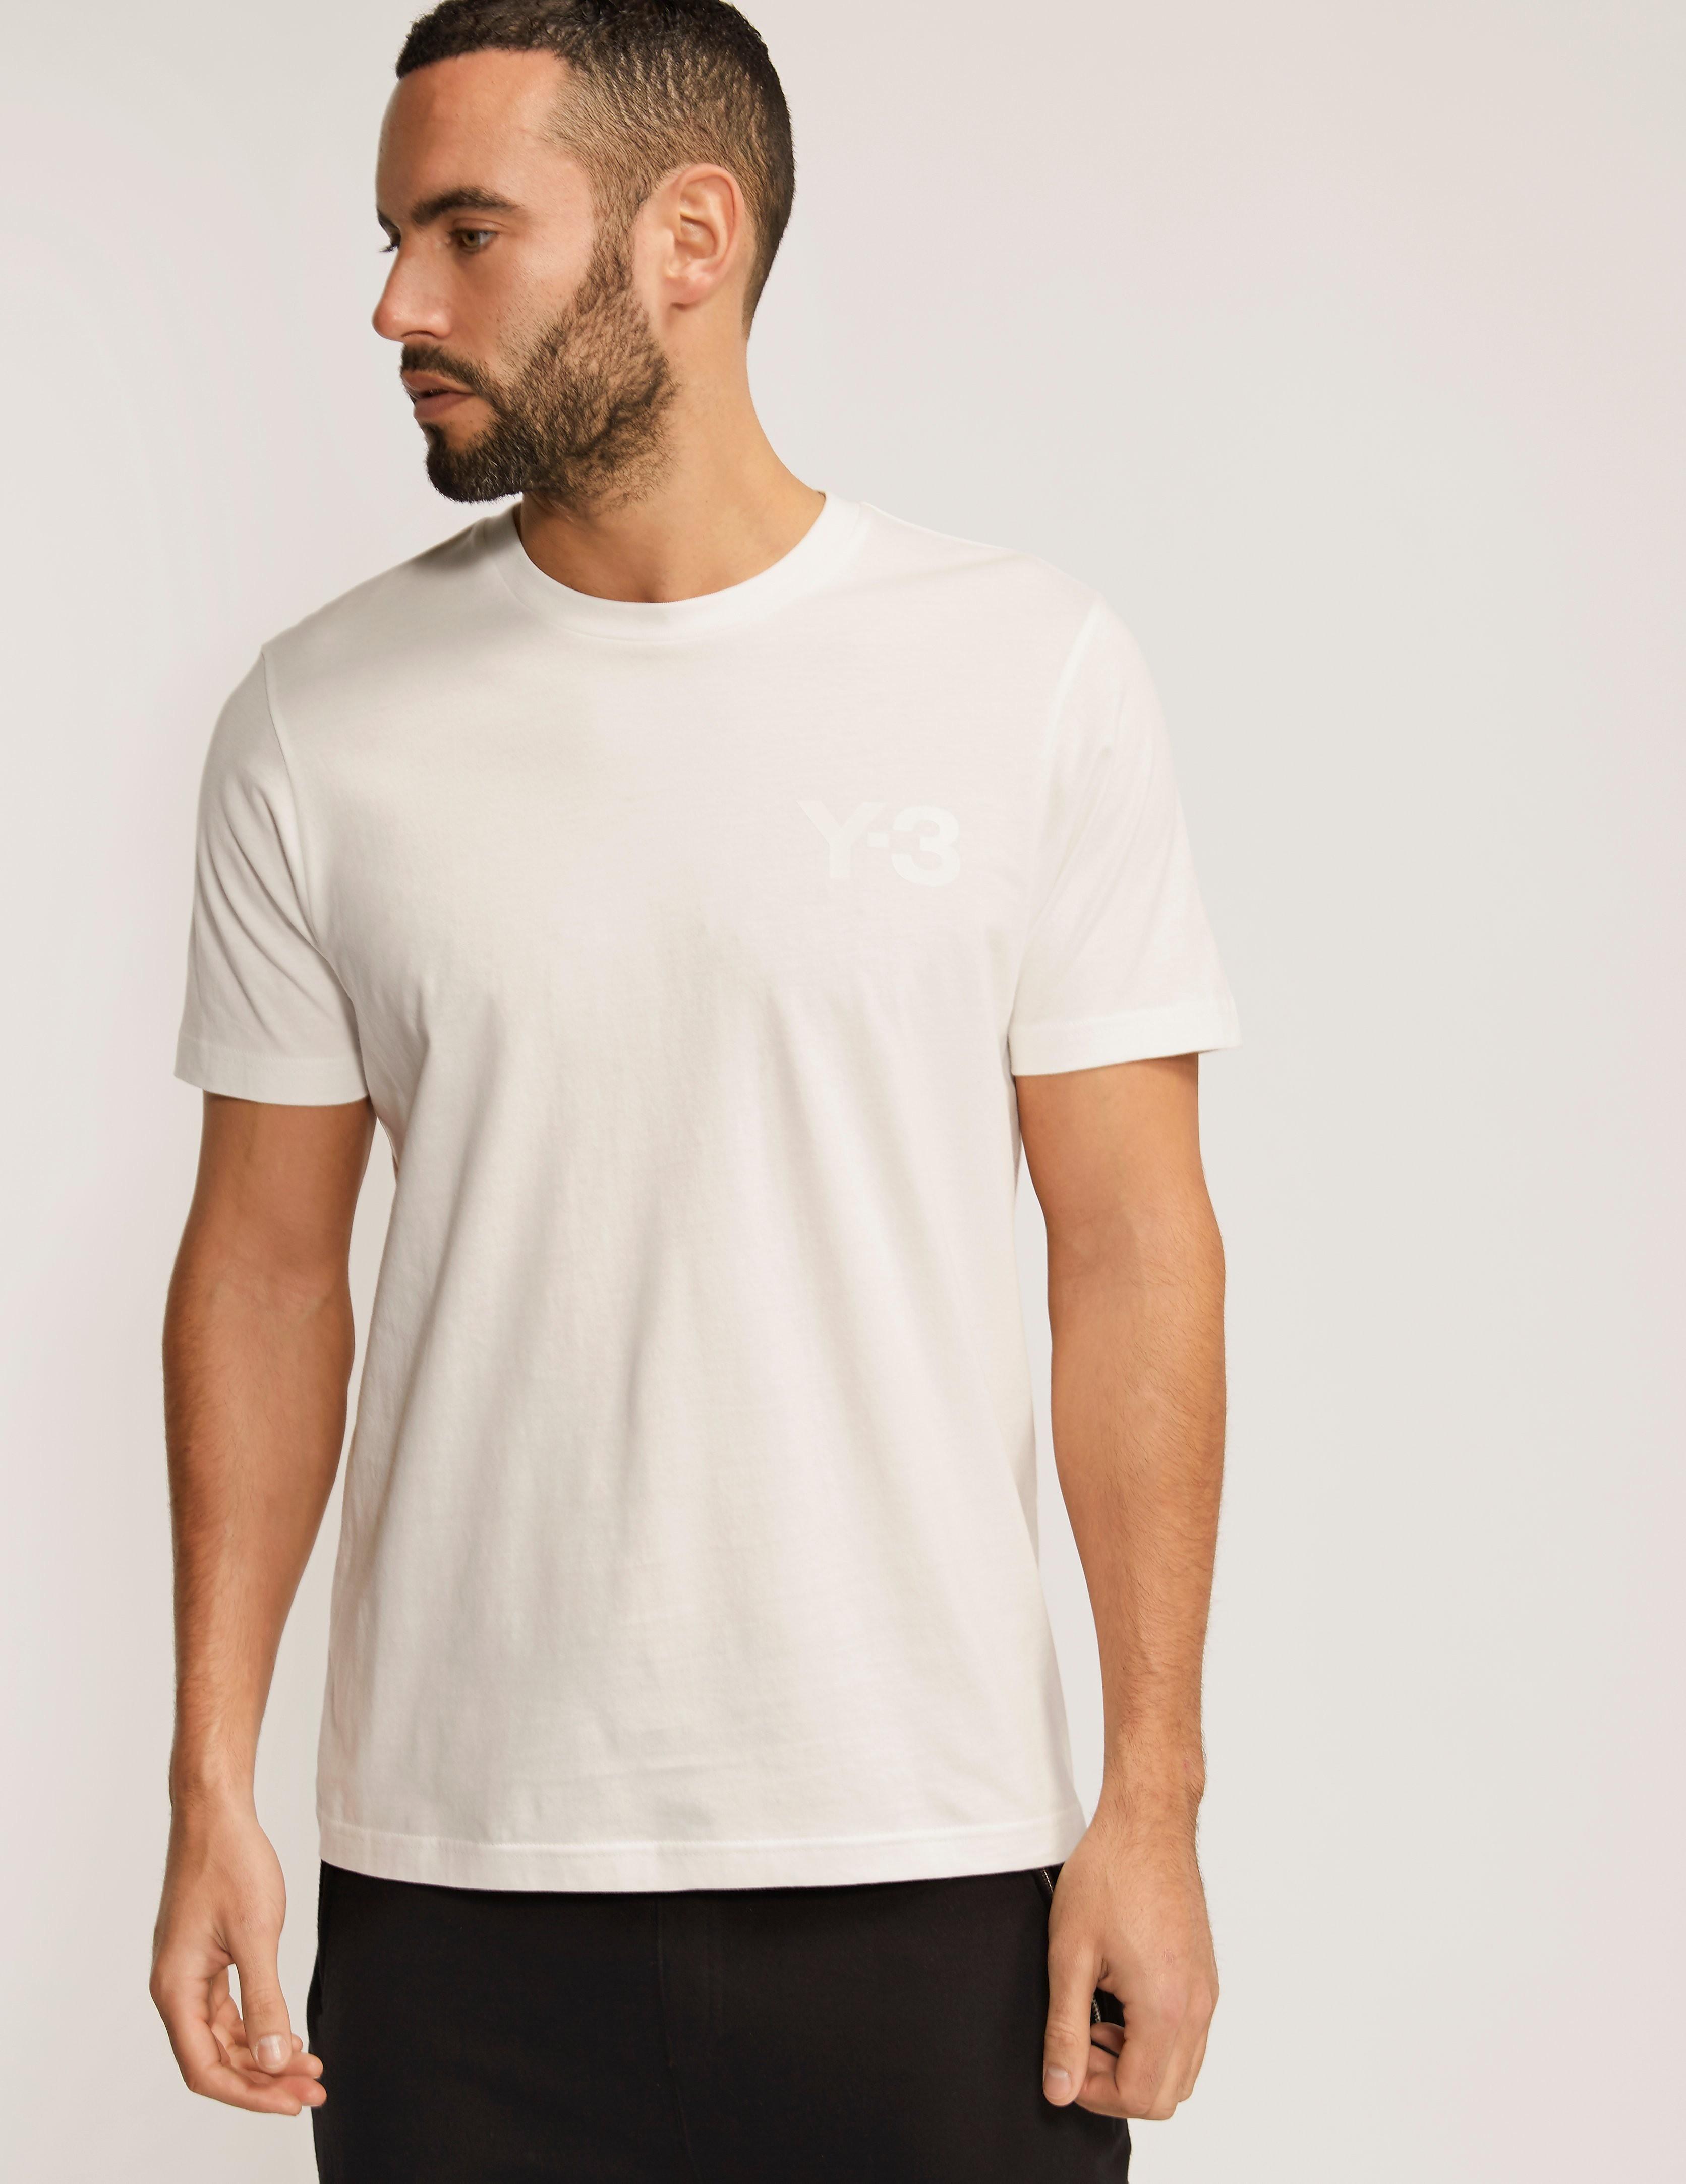 Y-3 Short Sleeve T-Shirt